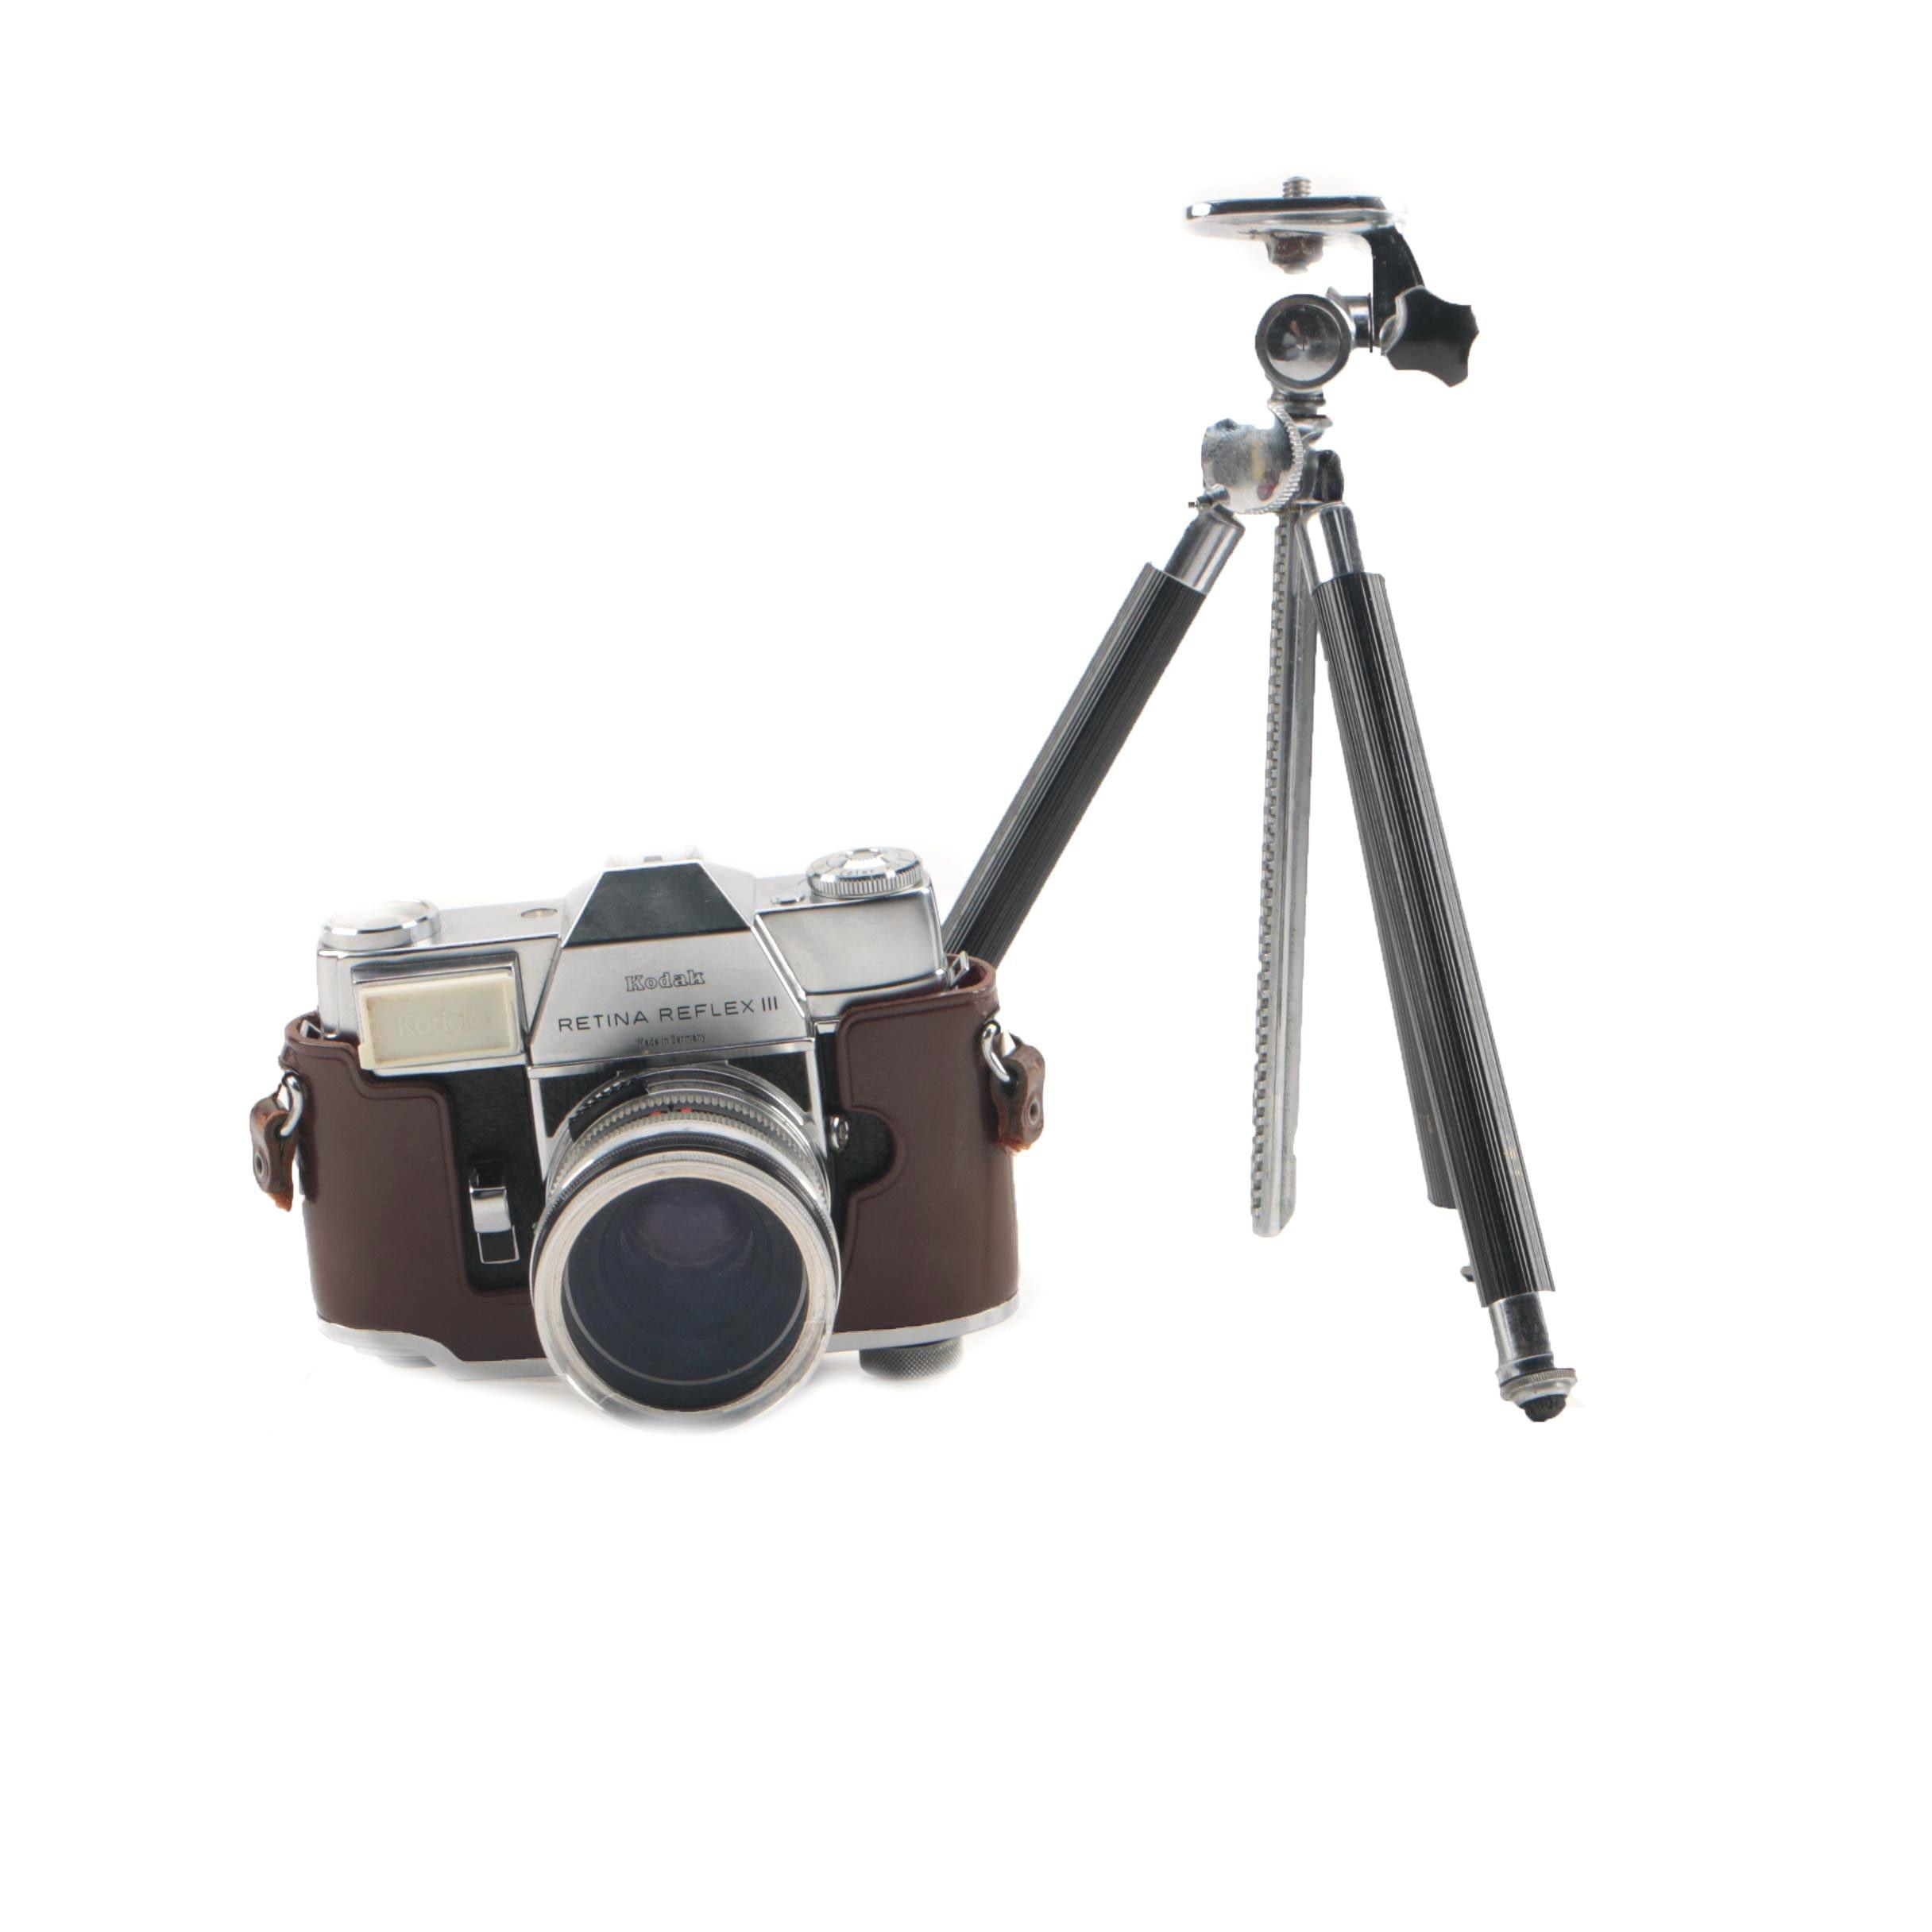 Kodak Retina Reflex III Camera and Tabletop Tripod